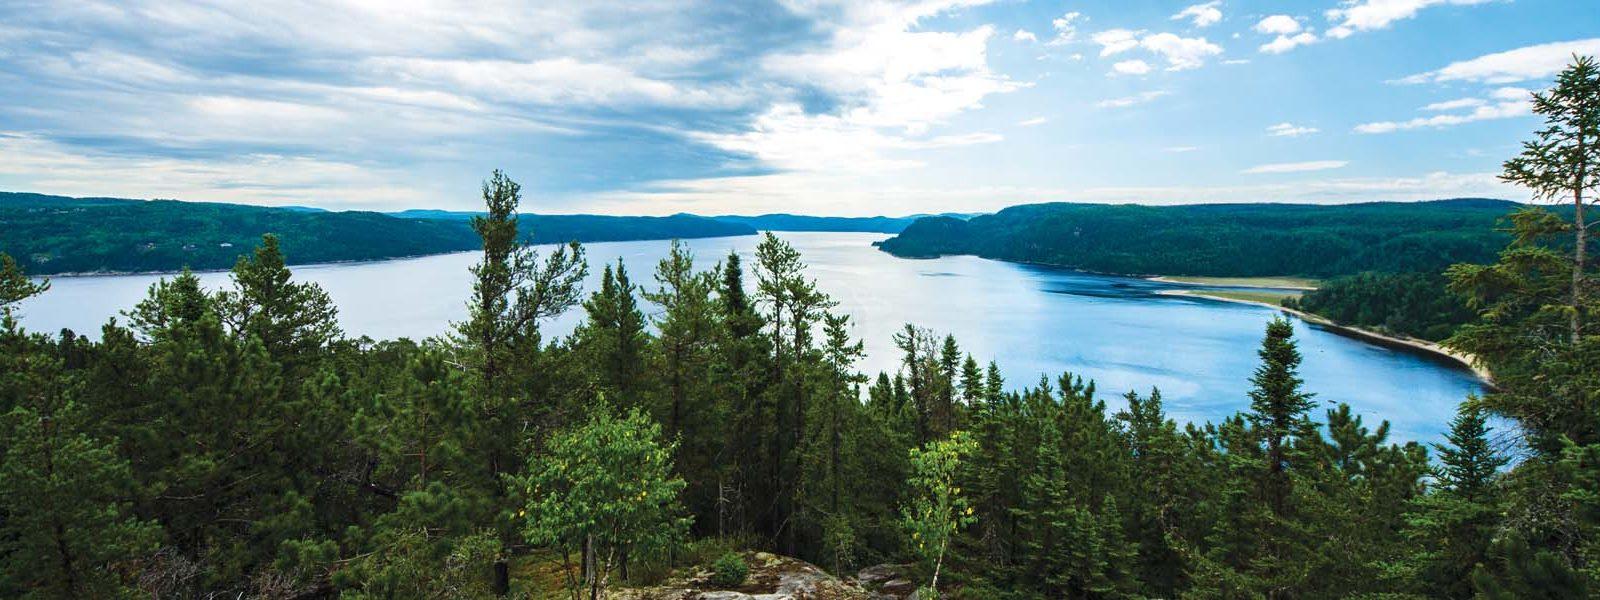 Saguenay_web